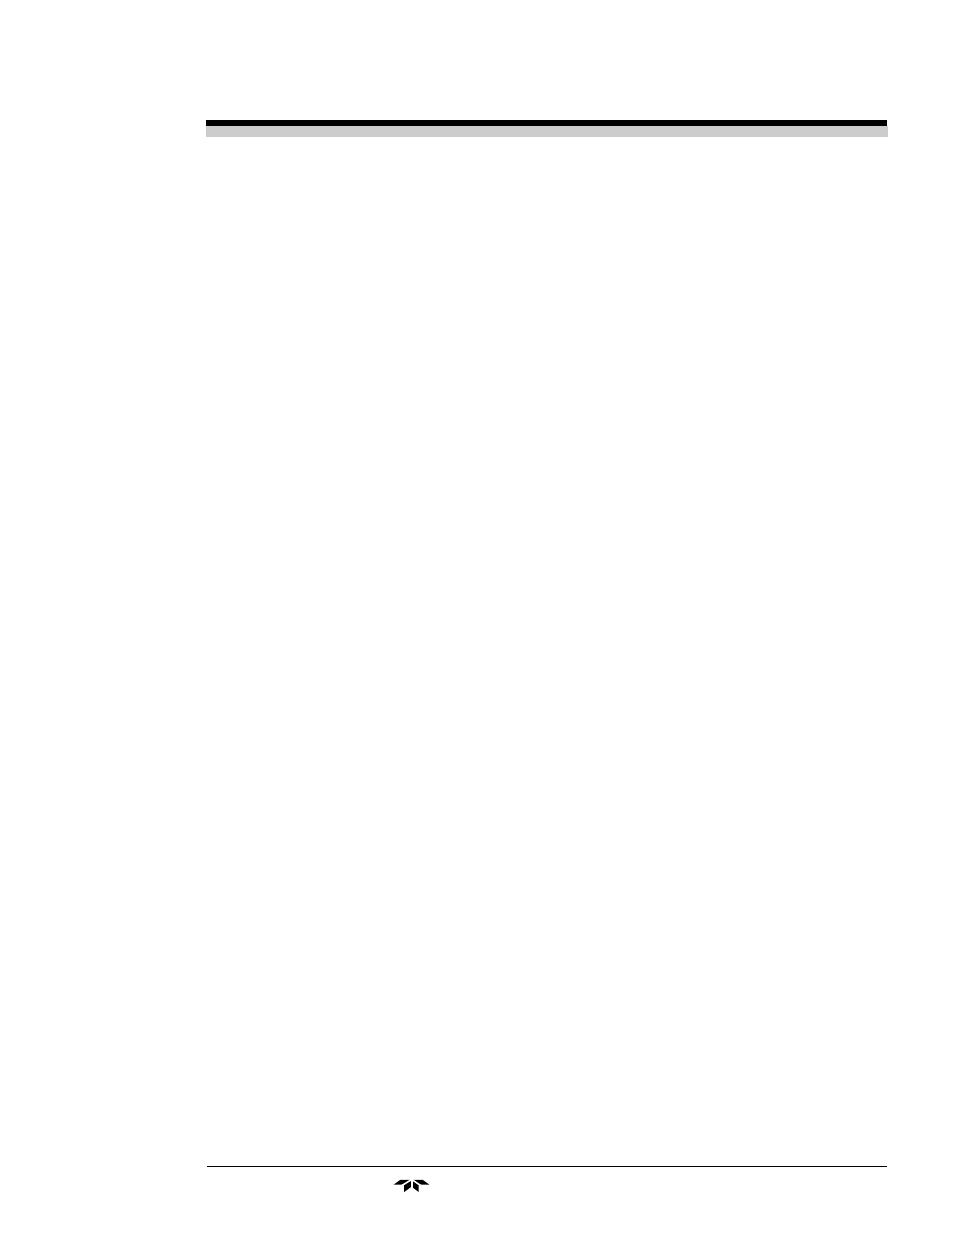 medium resolution of teledyne 3010mb split architecture paramagnetic oxygen analyzer user manual page 67 70